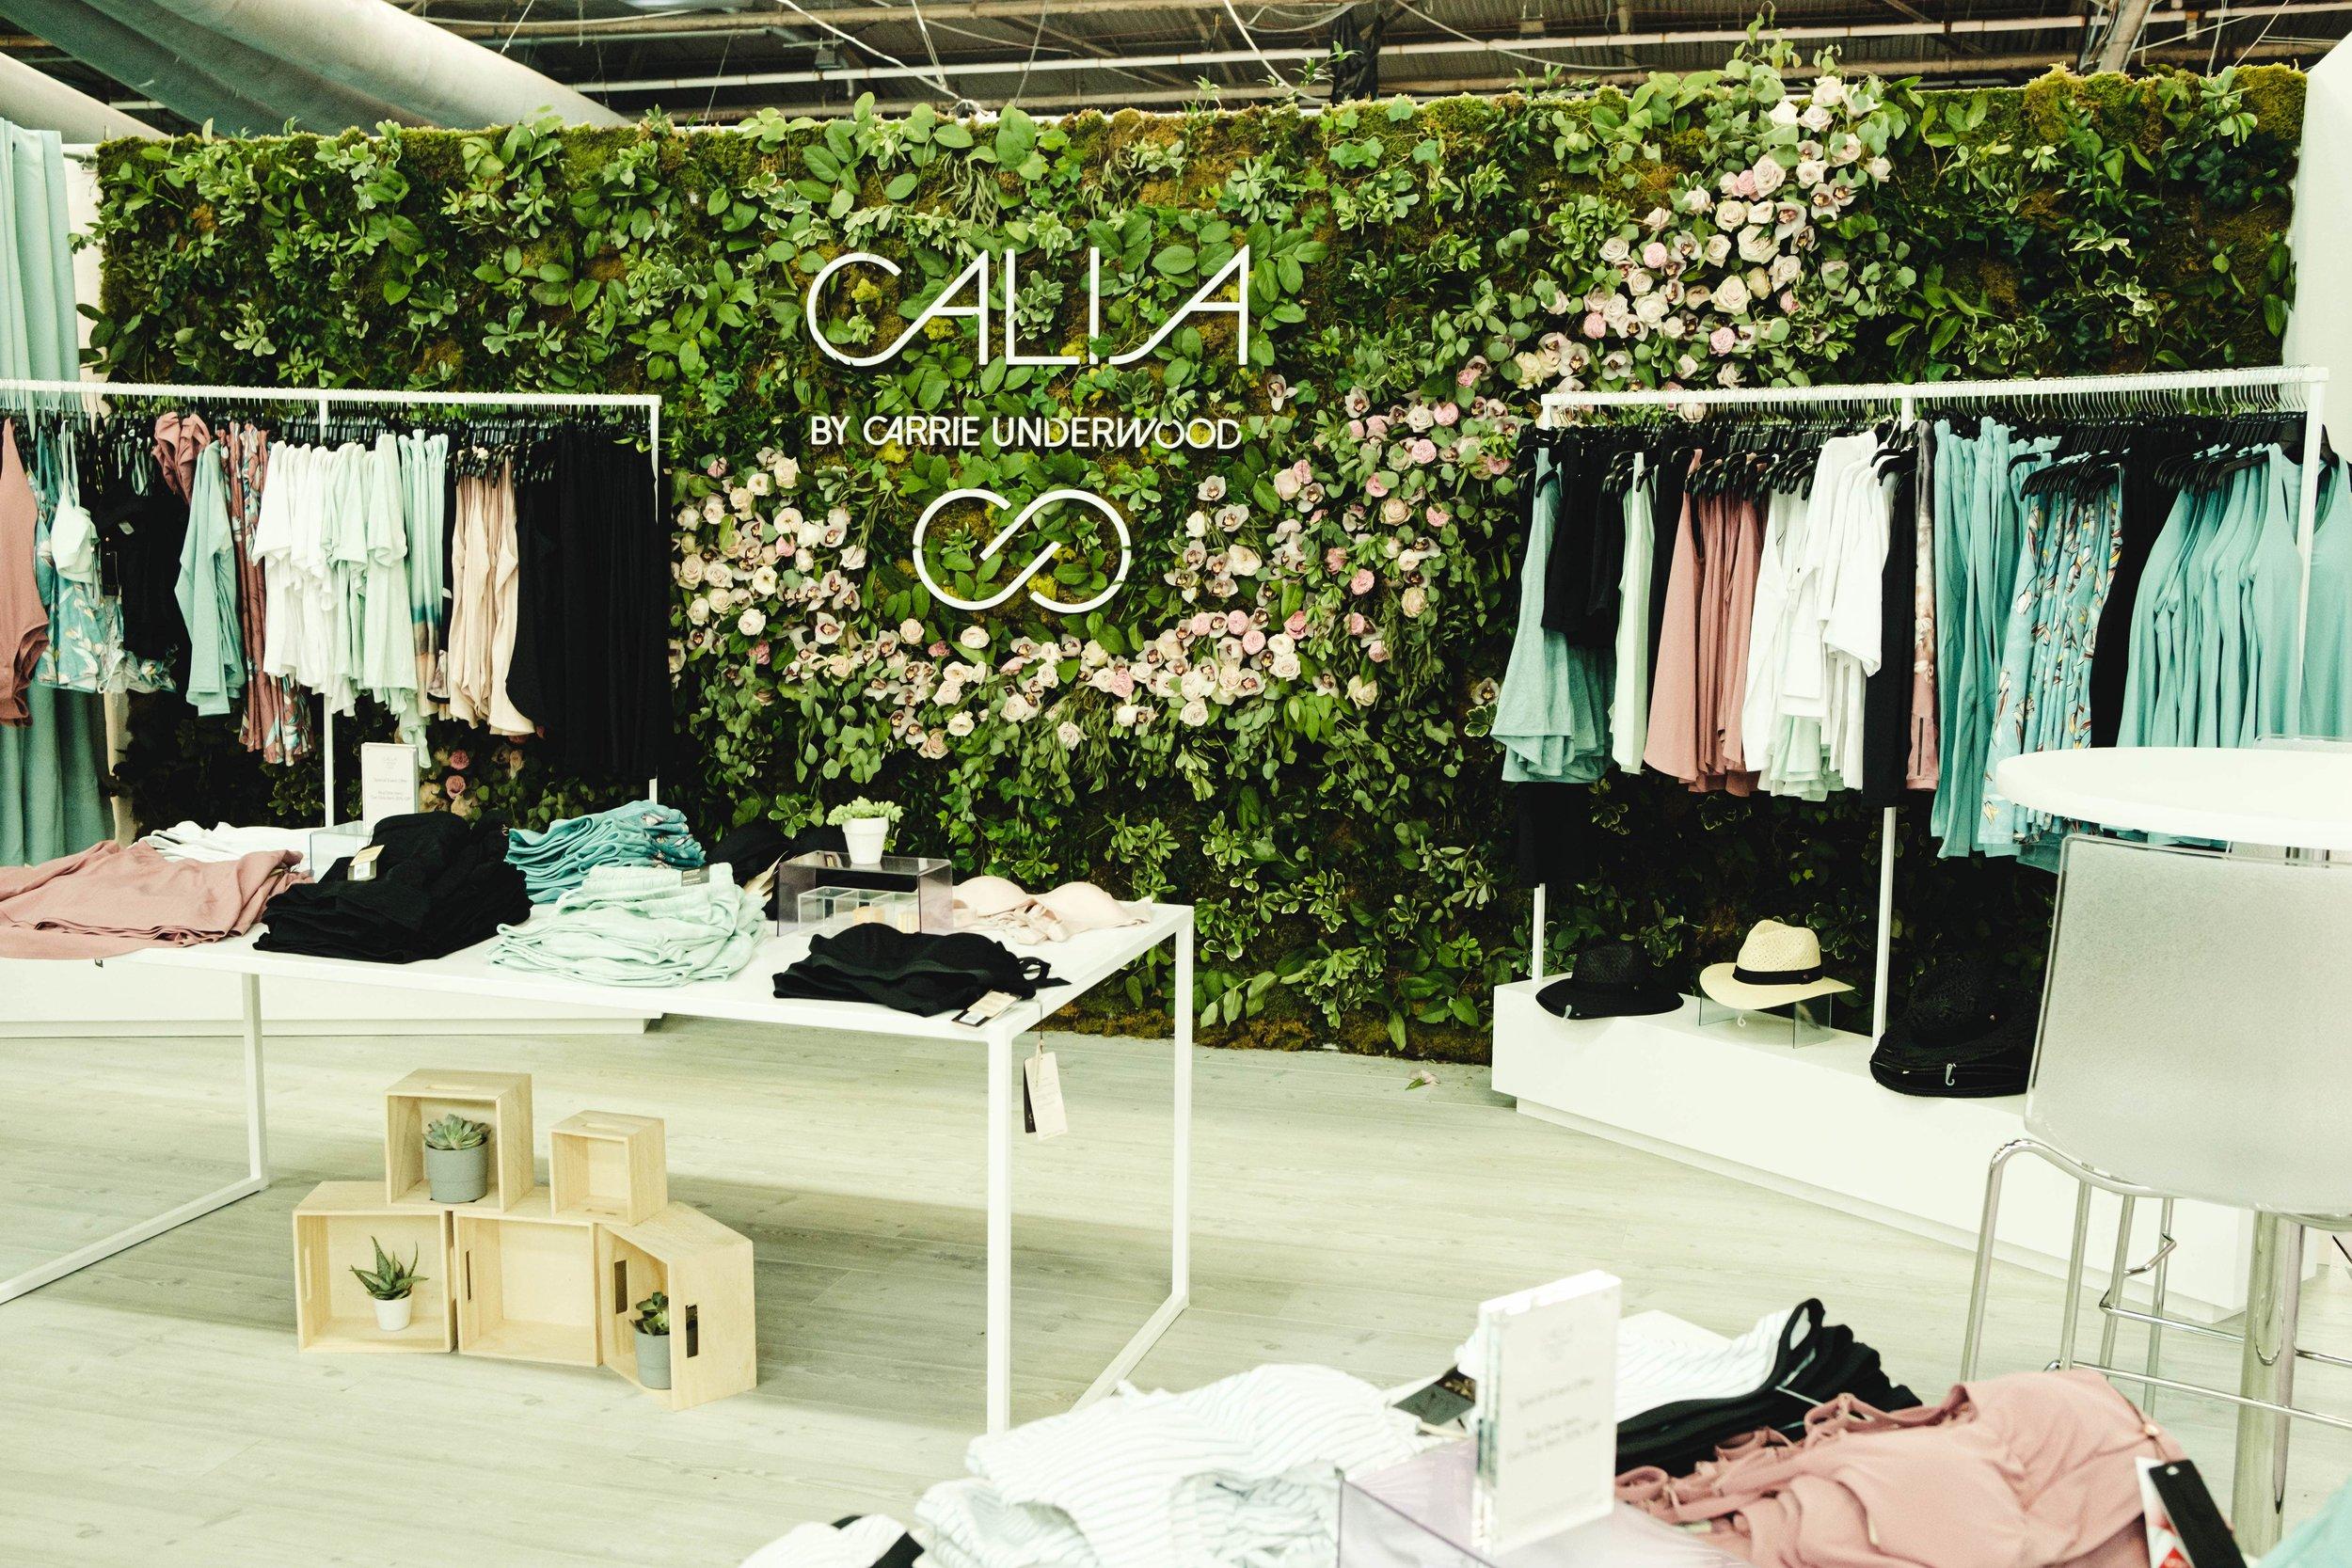 Calia by Carrie Underwood Greenery Wall